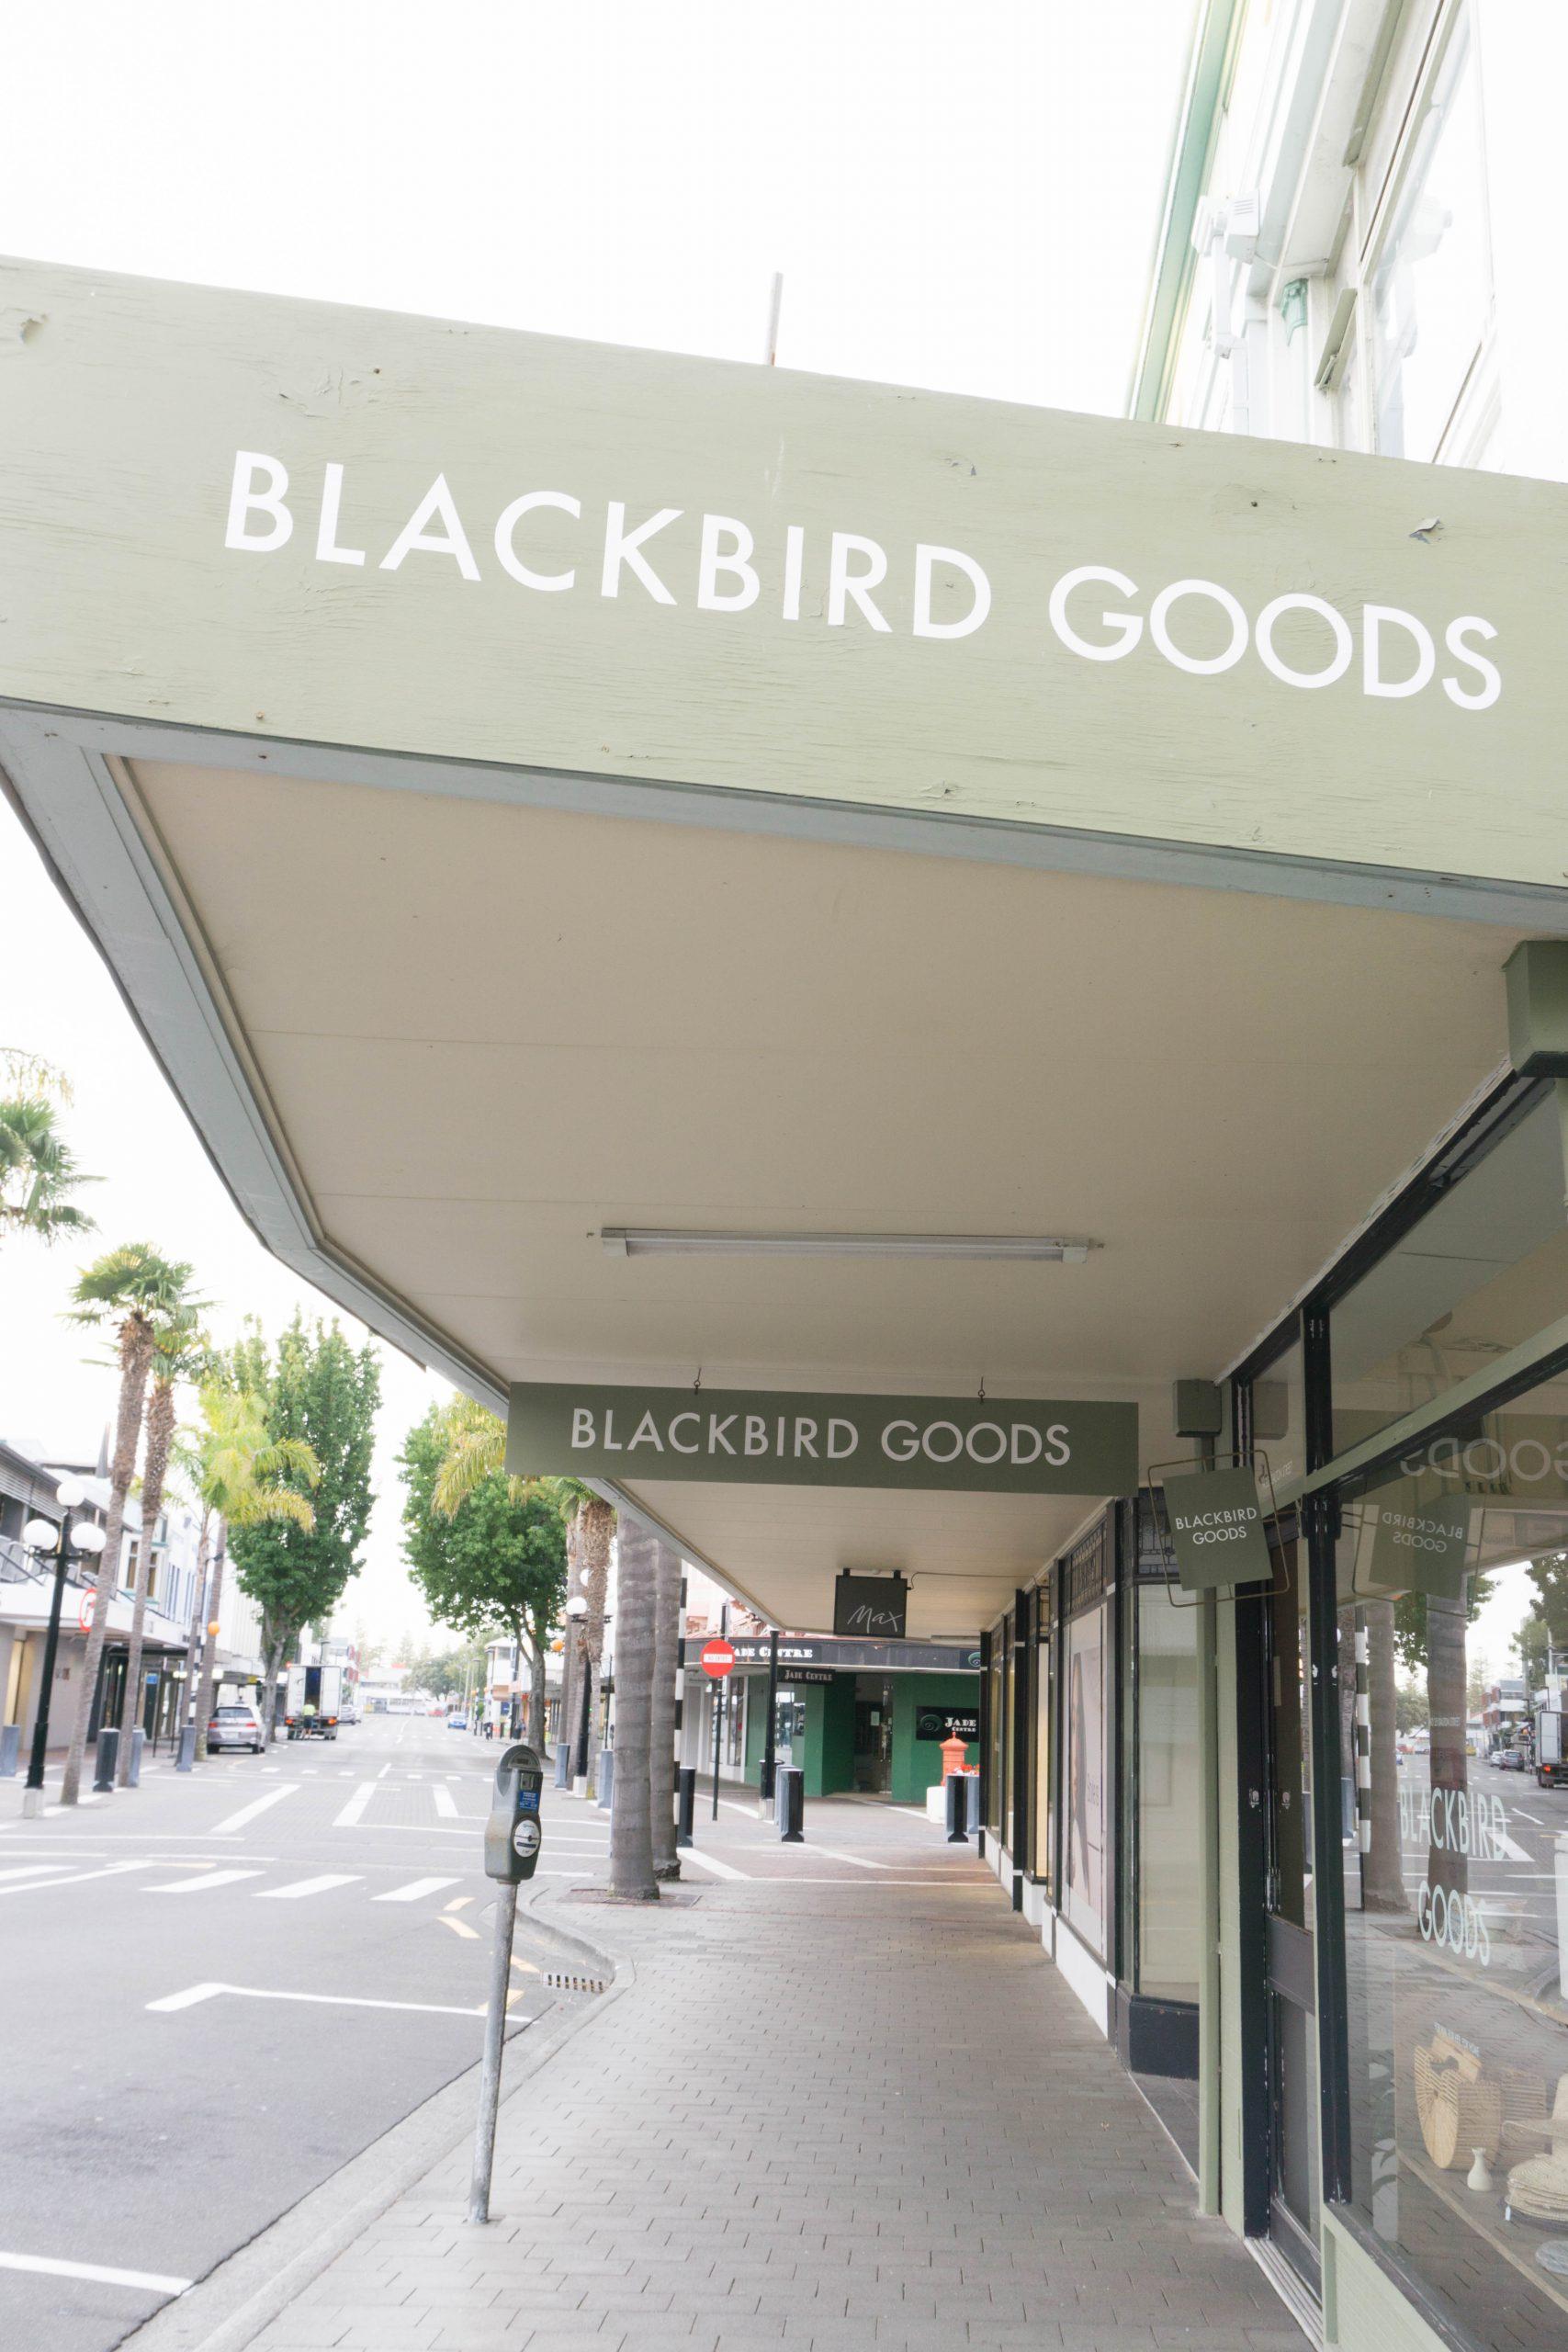 Blackbird Goods in Napier